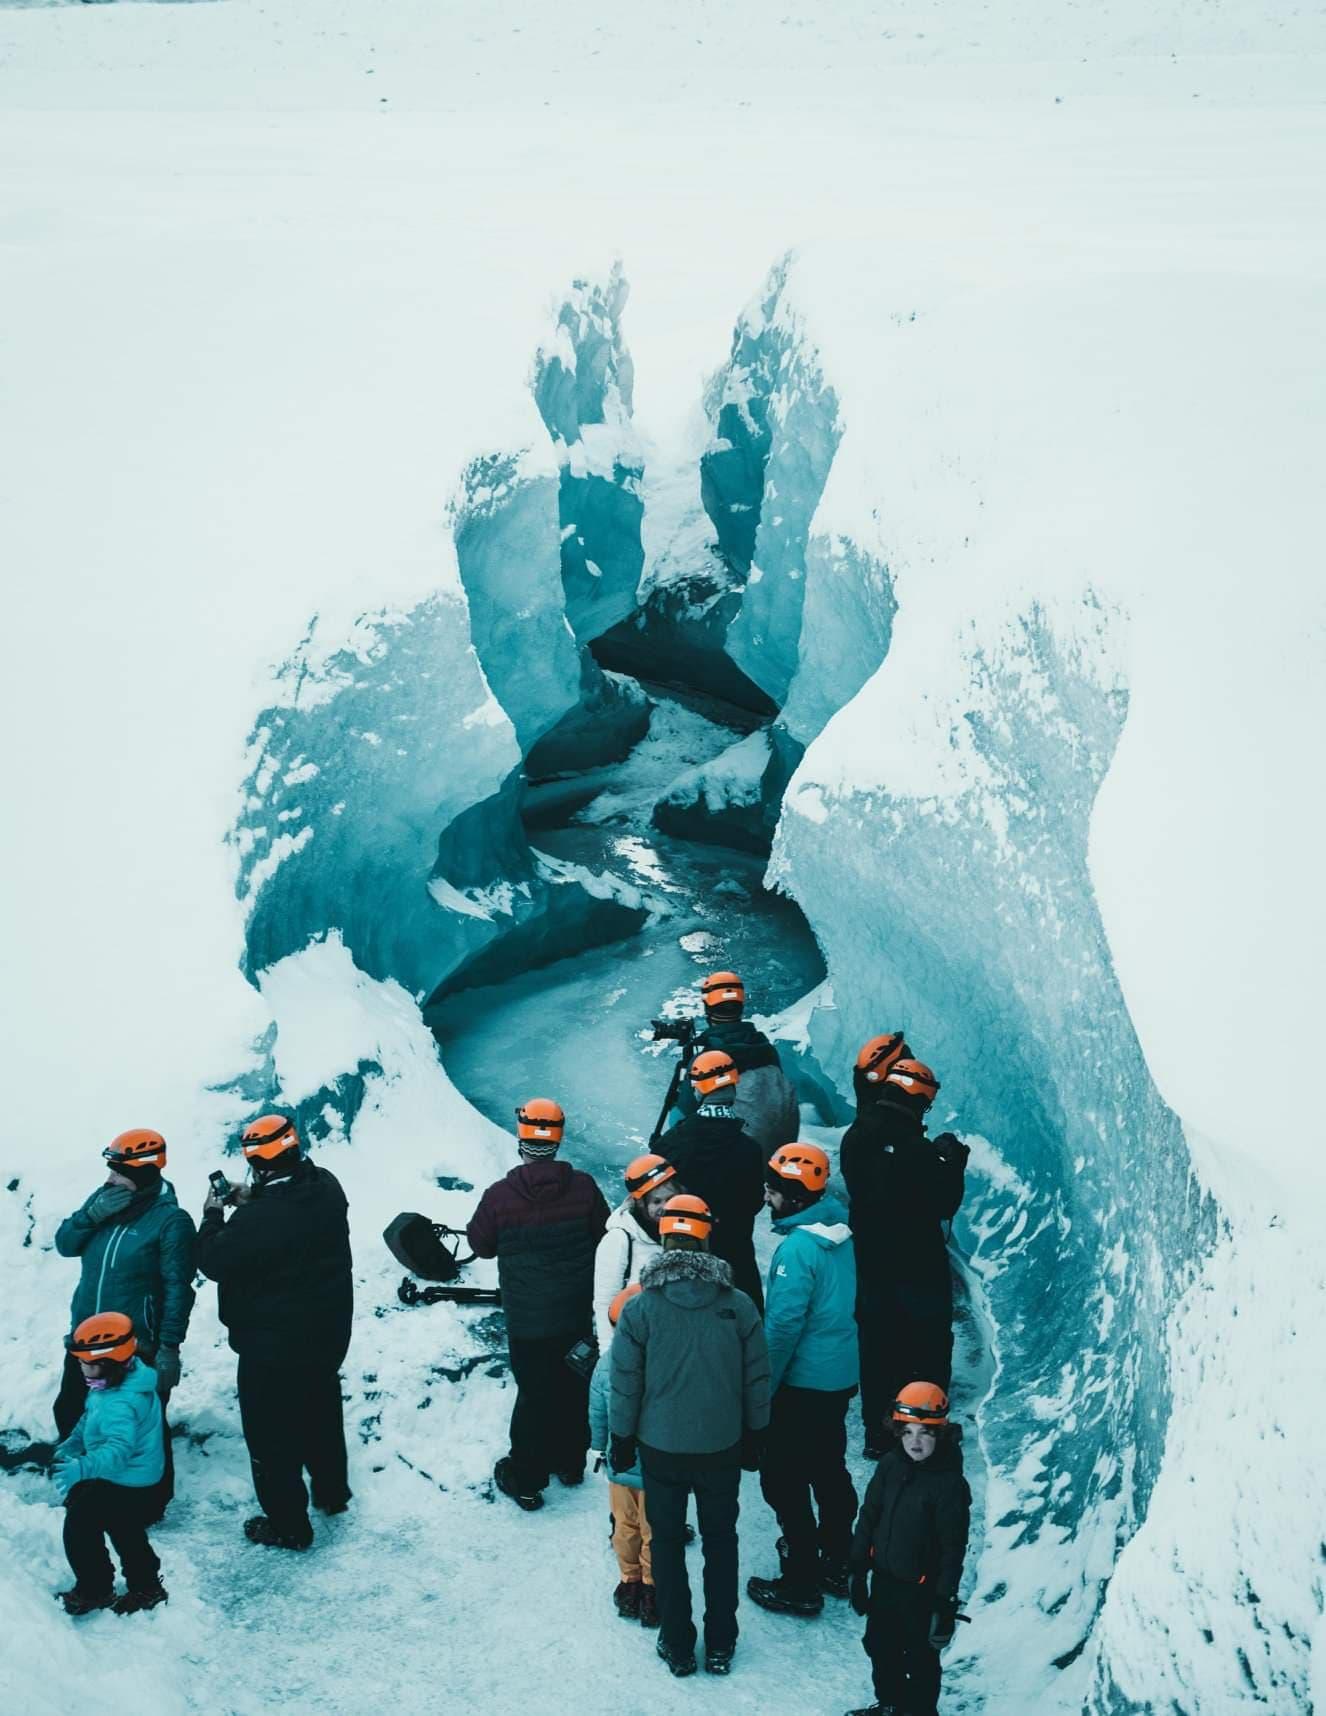 iceland ice cave tour by vatnajökull glacier